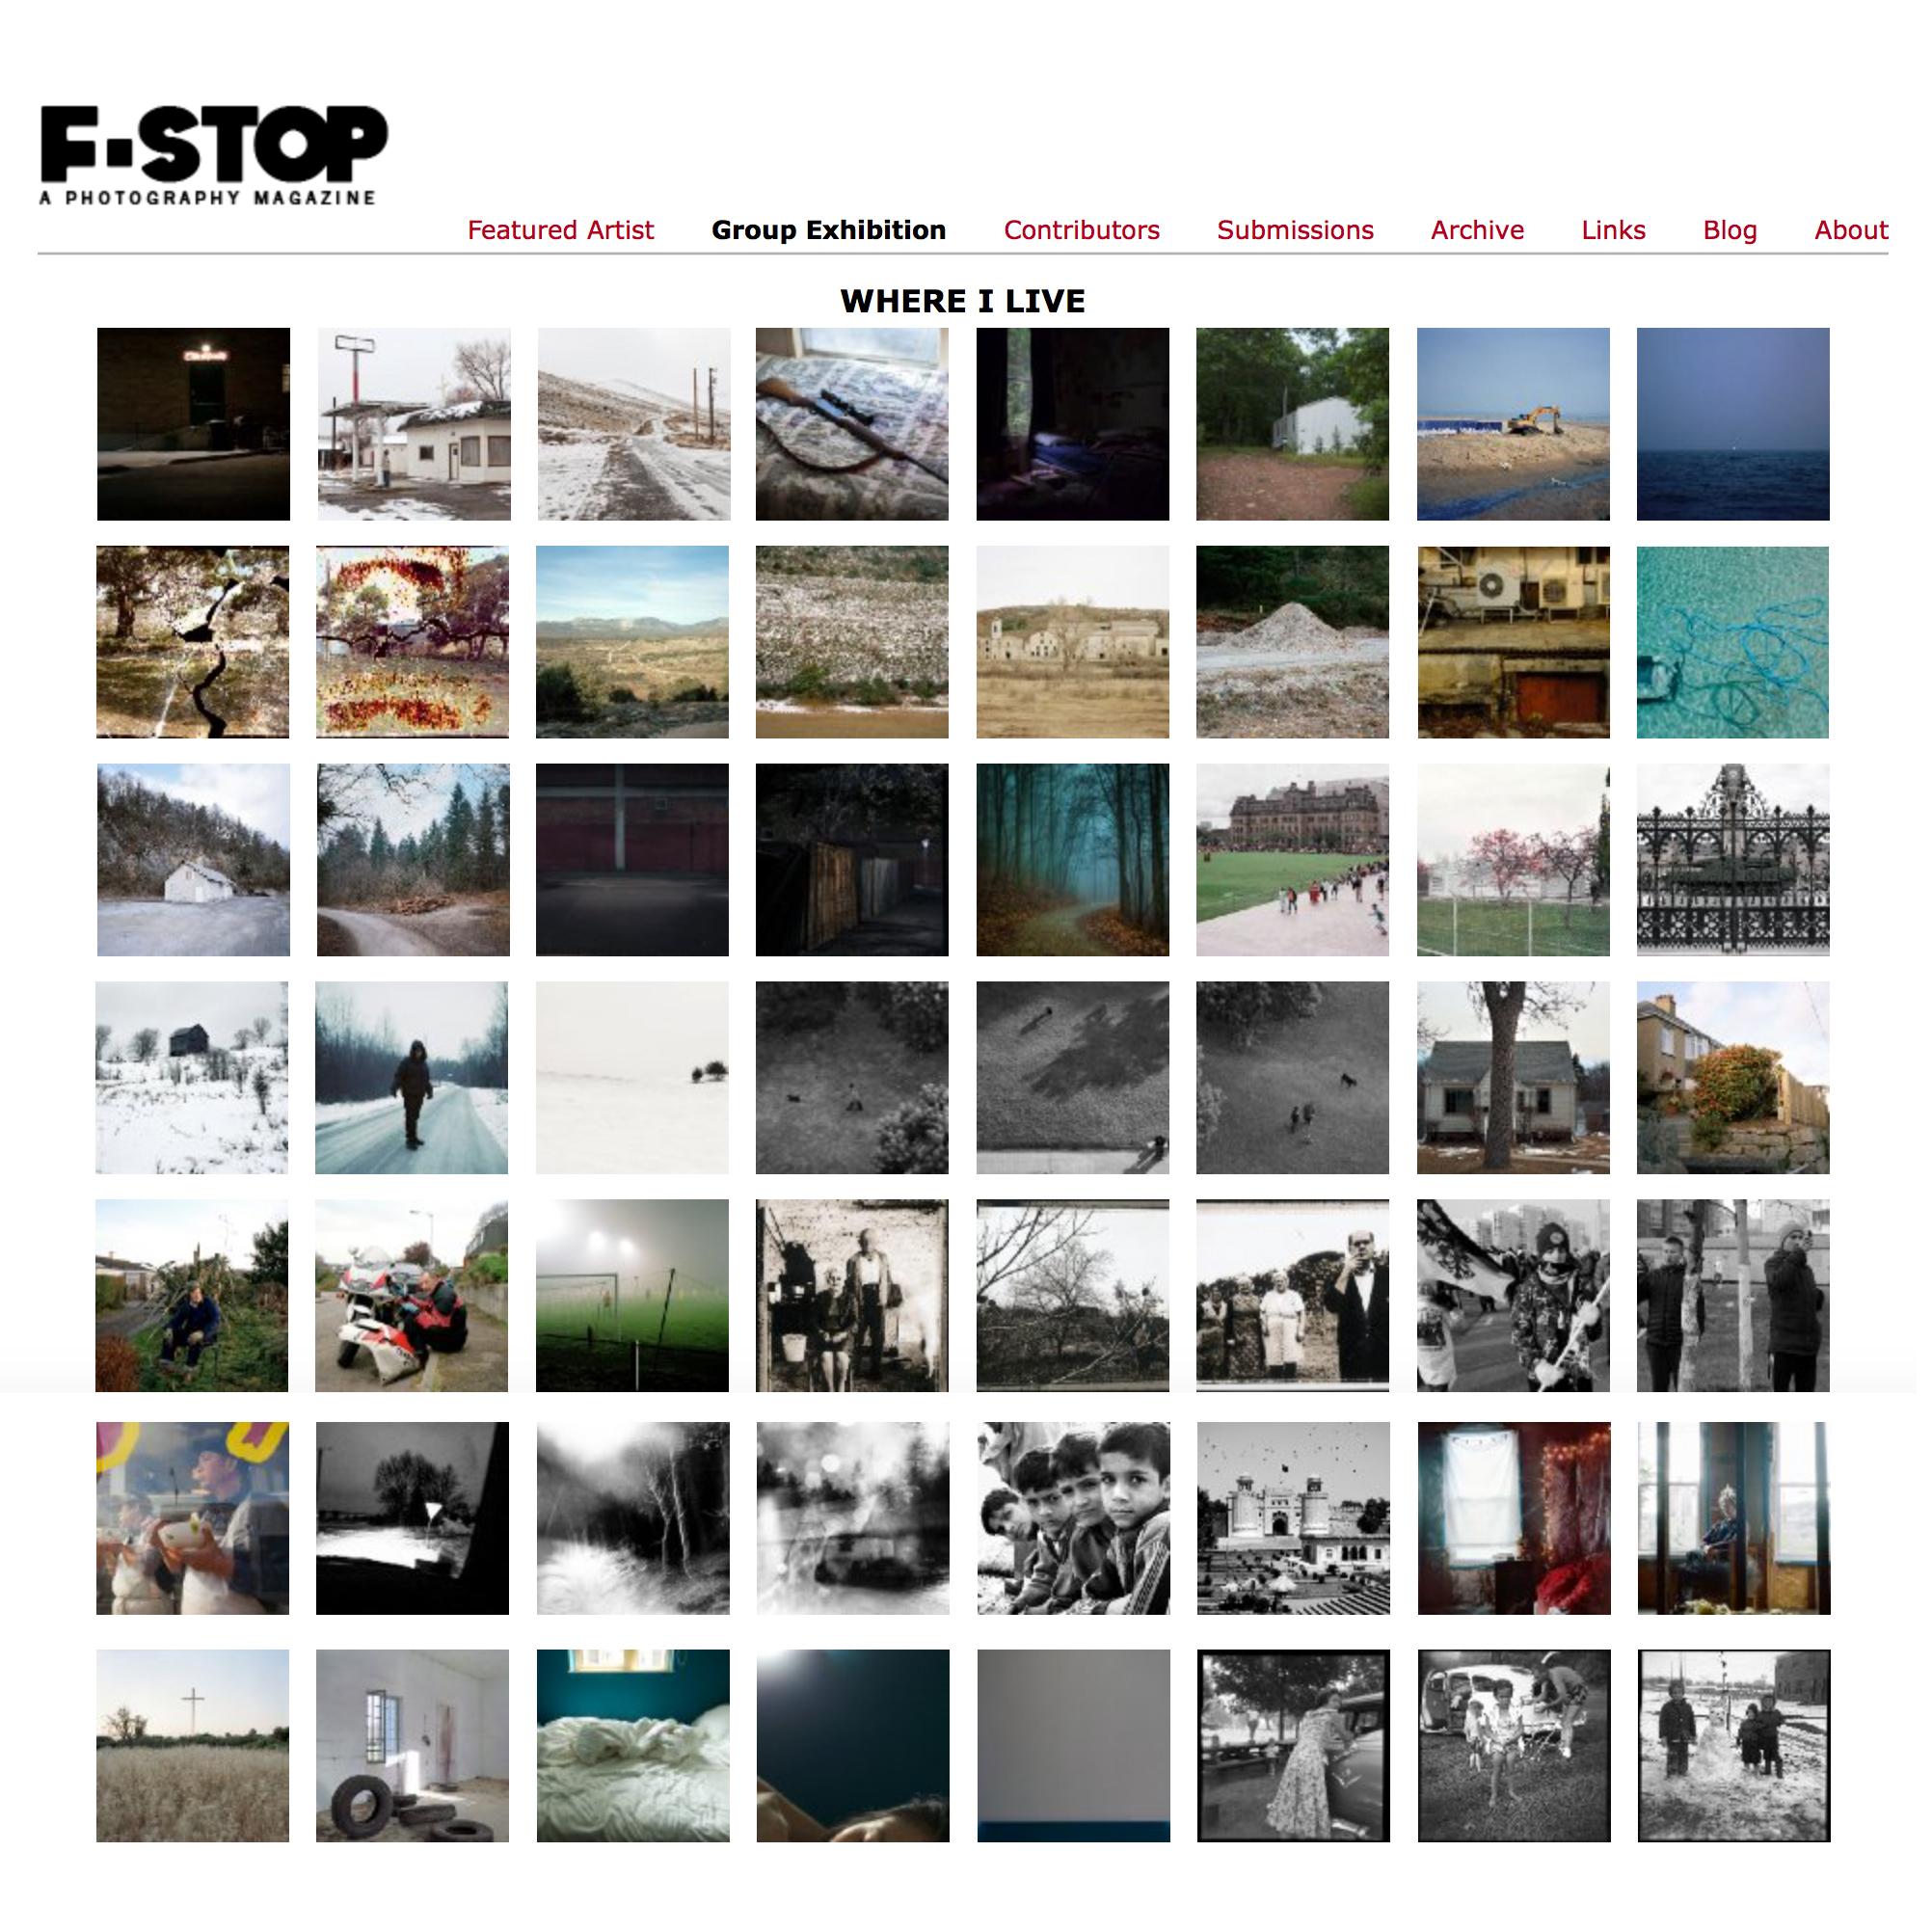 f-stop-where-i-live22.jpg